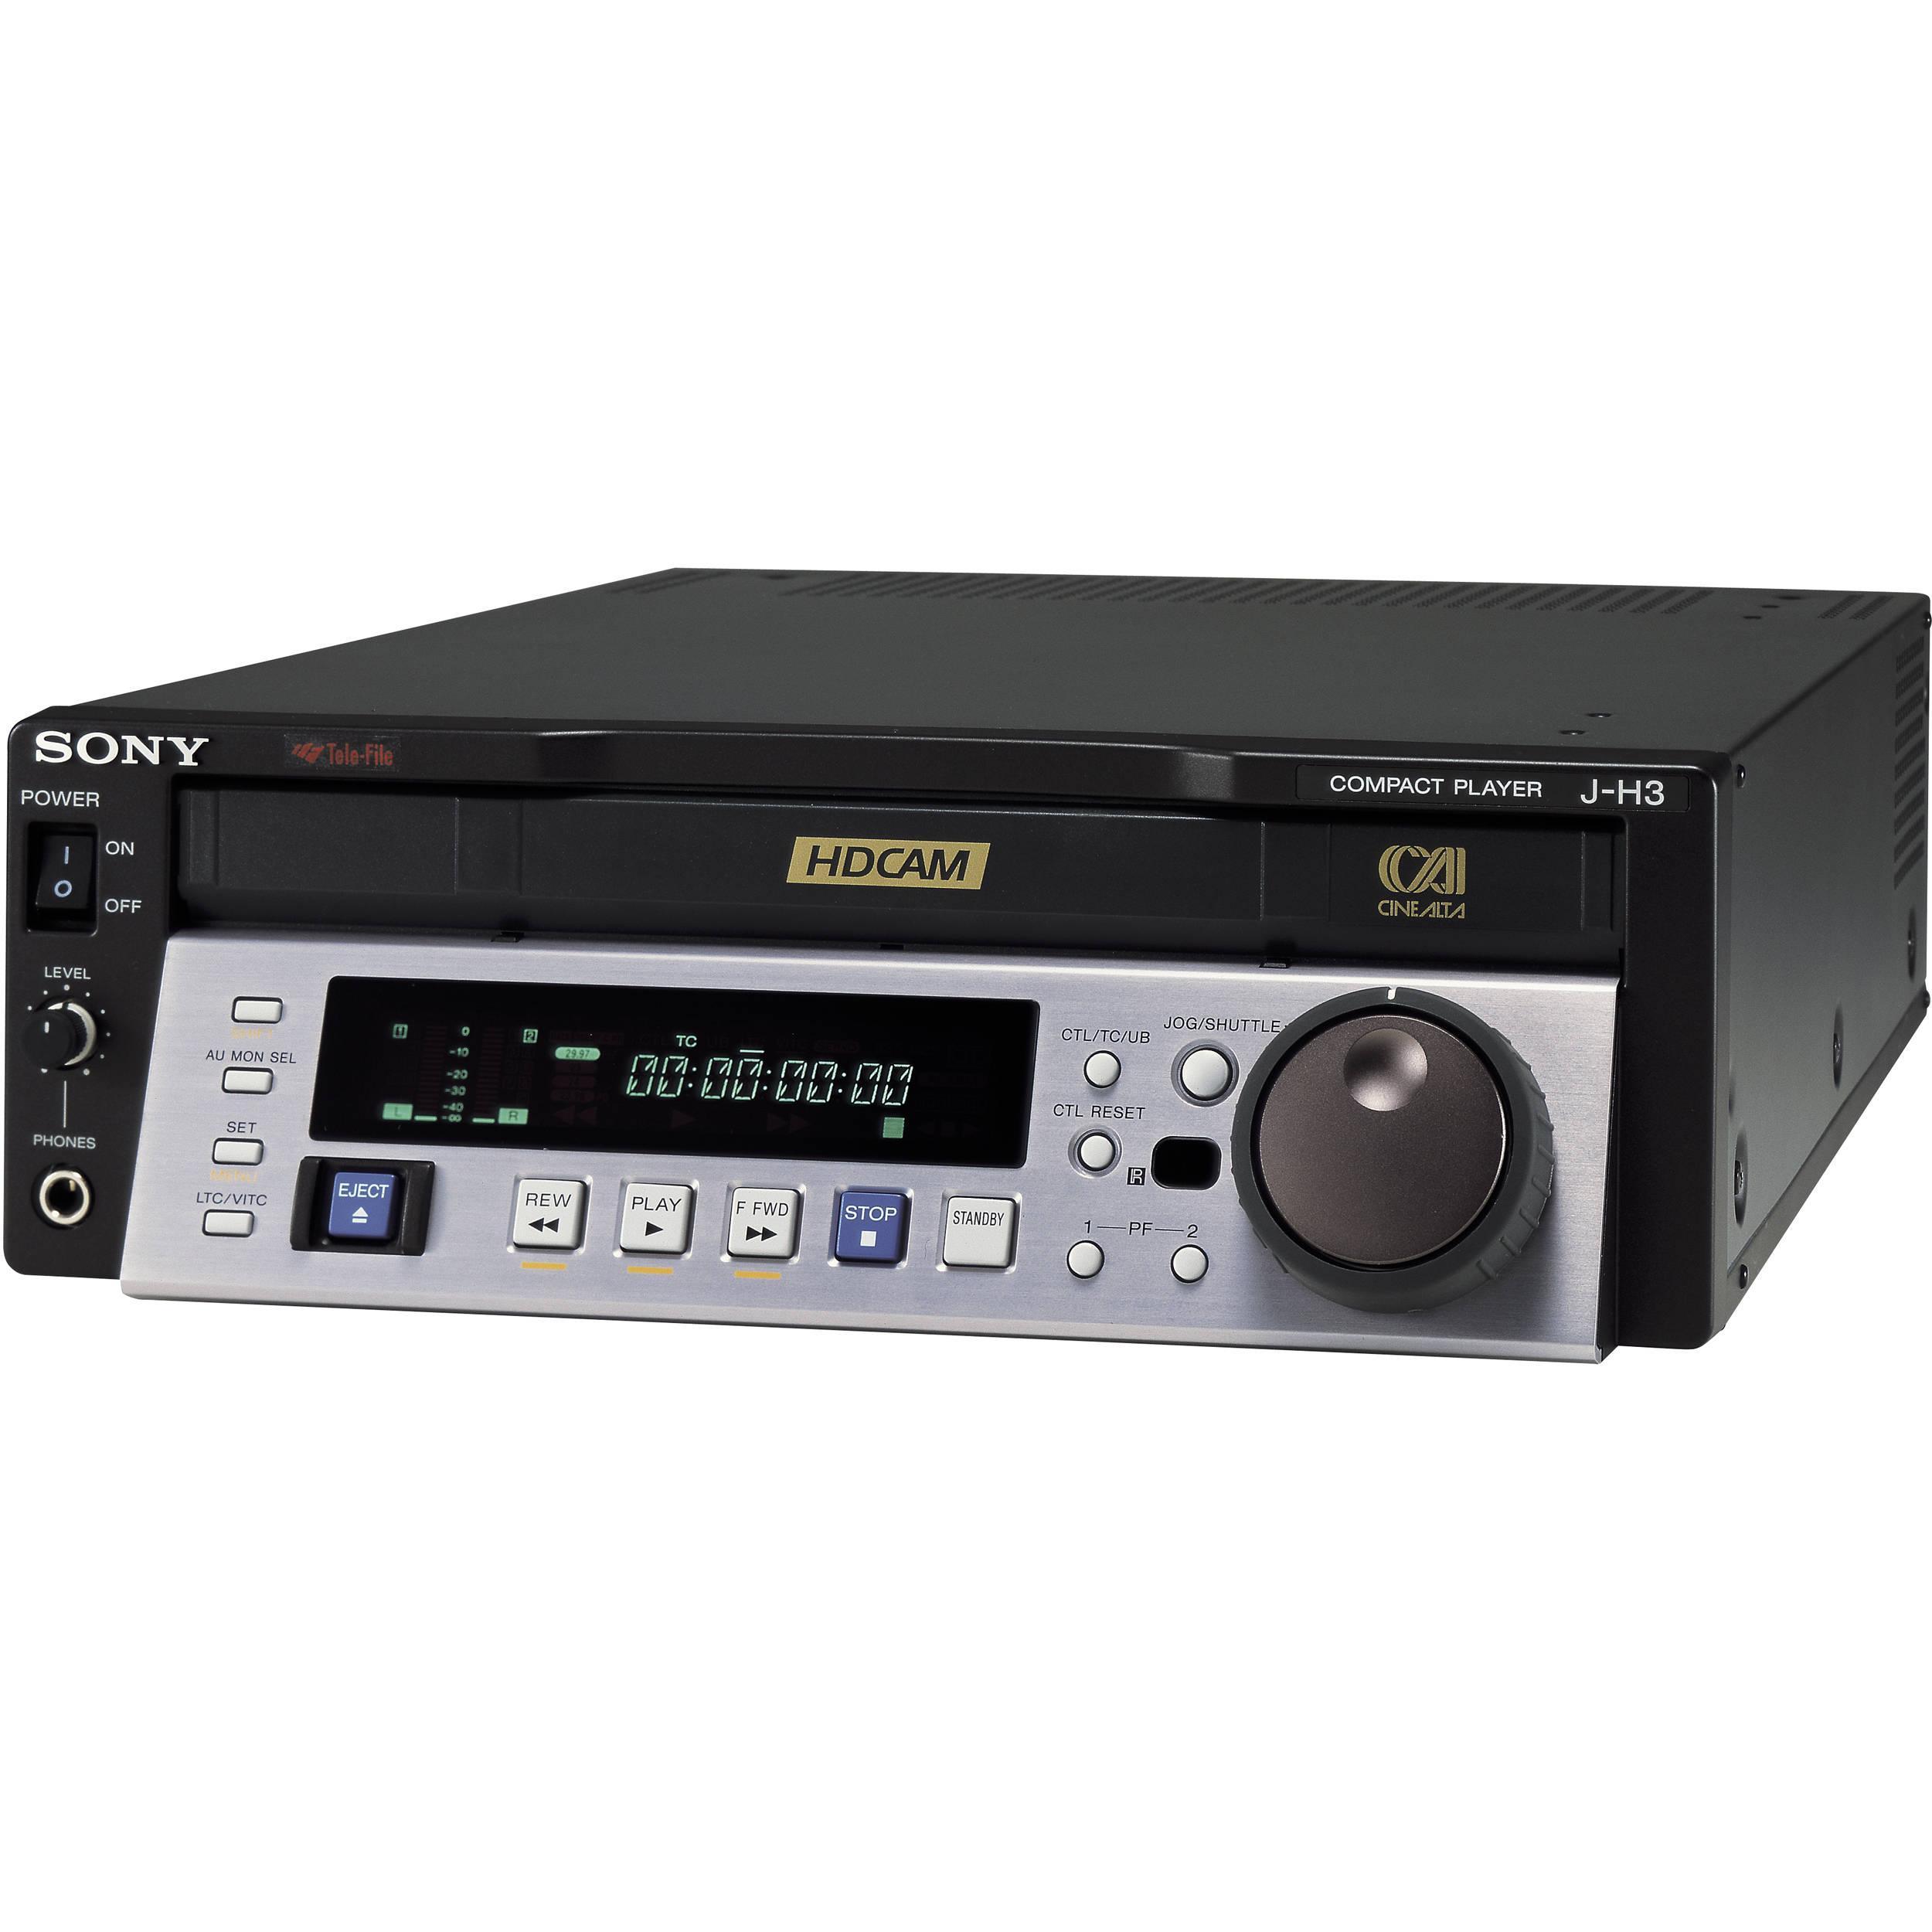 sony jh 3 hdcam digital video cassette player jh3 b h photo rh bhphotovideo com Sony TV Repair Manual Sony M 80 Manual